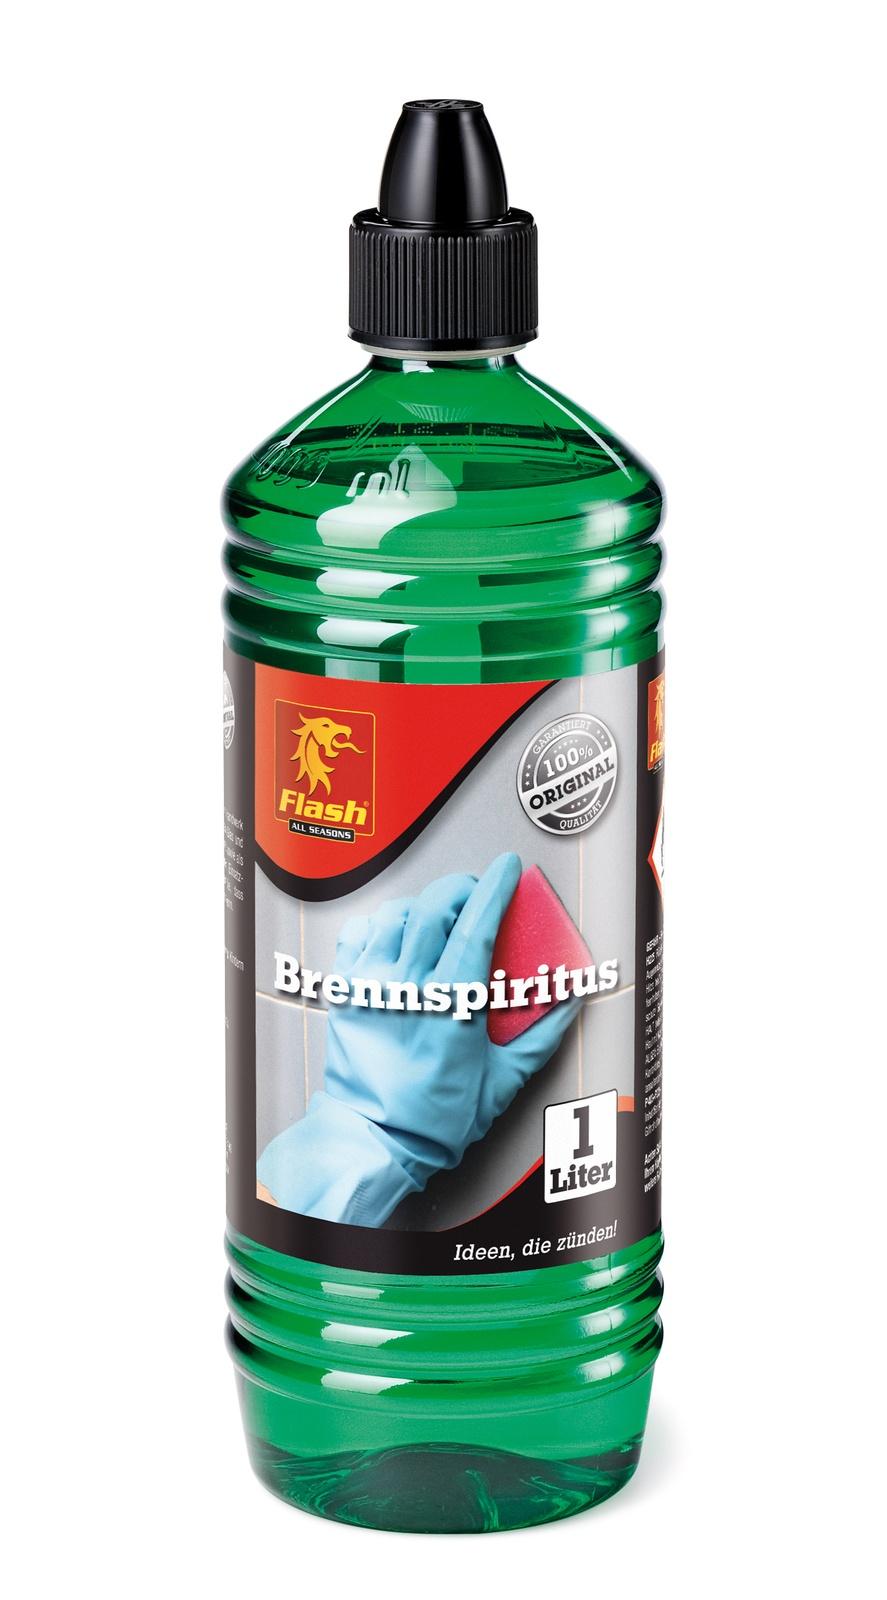 FLASH Brennspiritus 1000ml